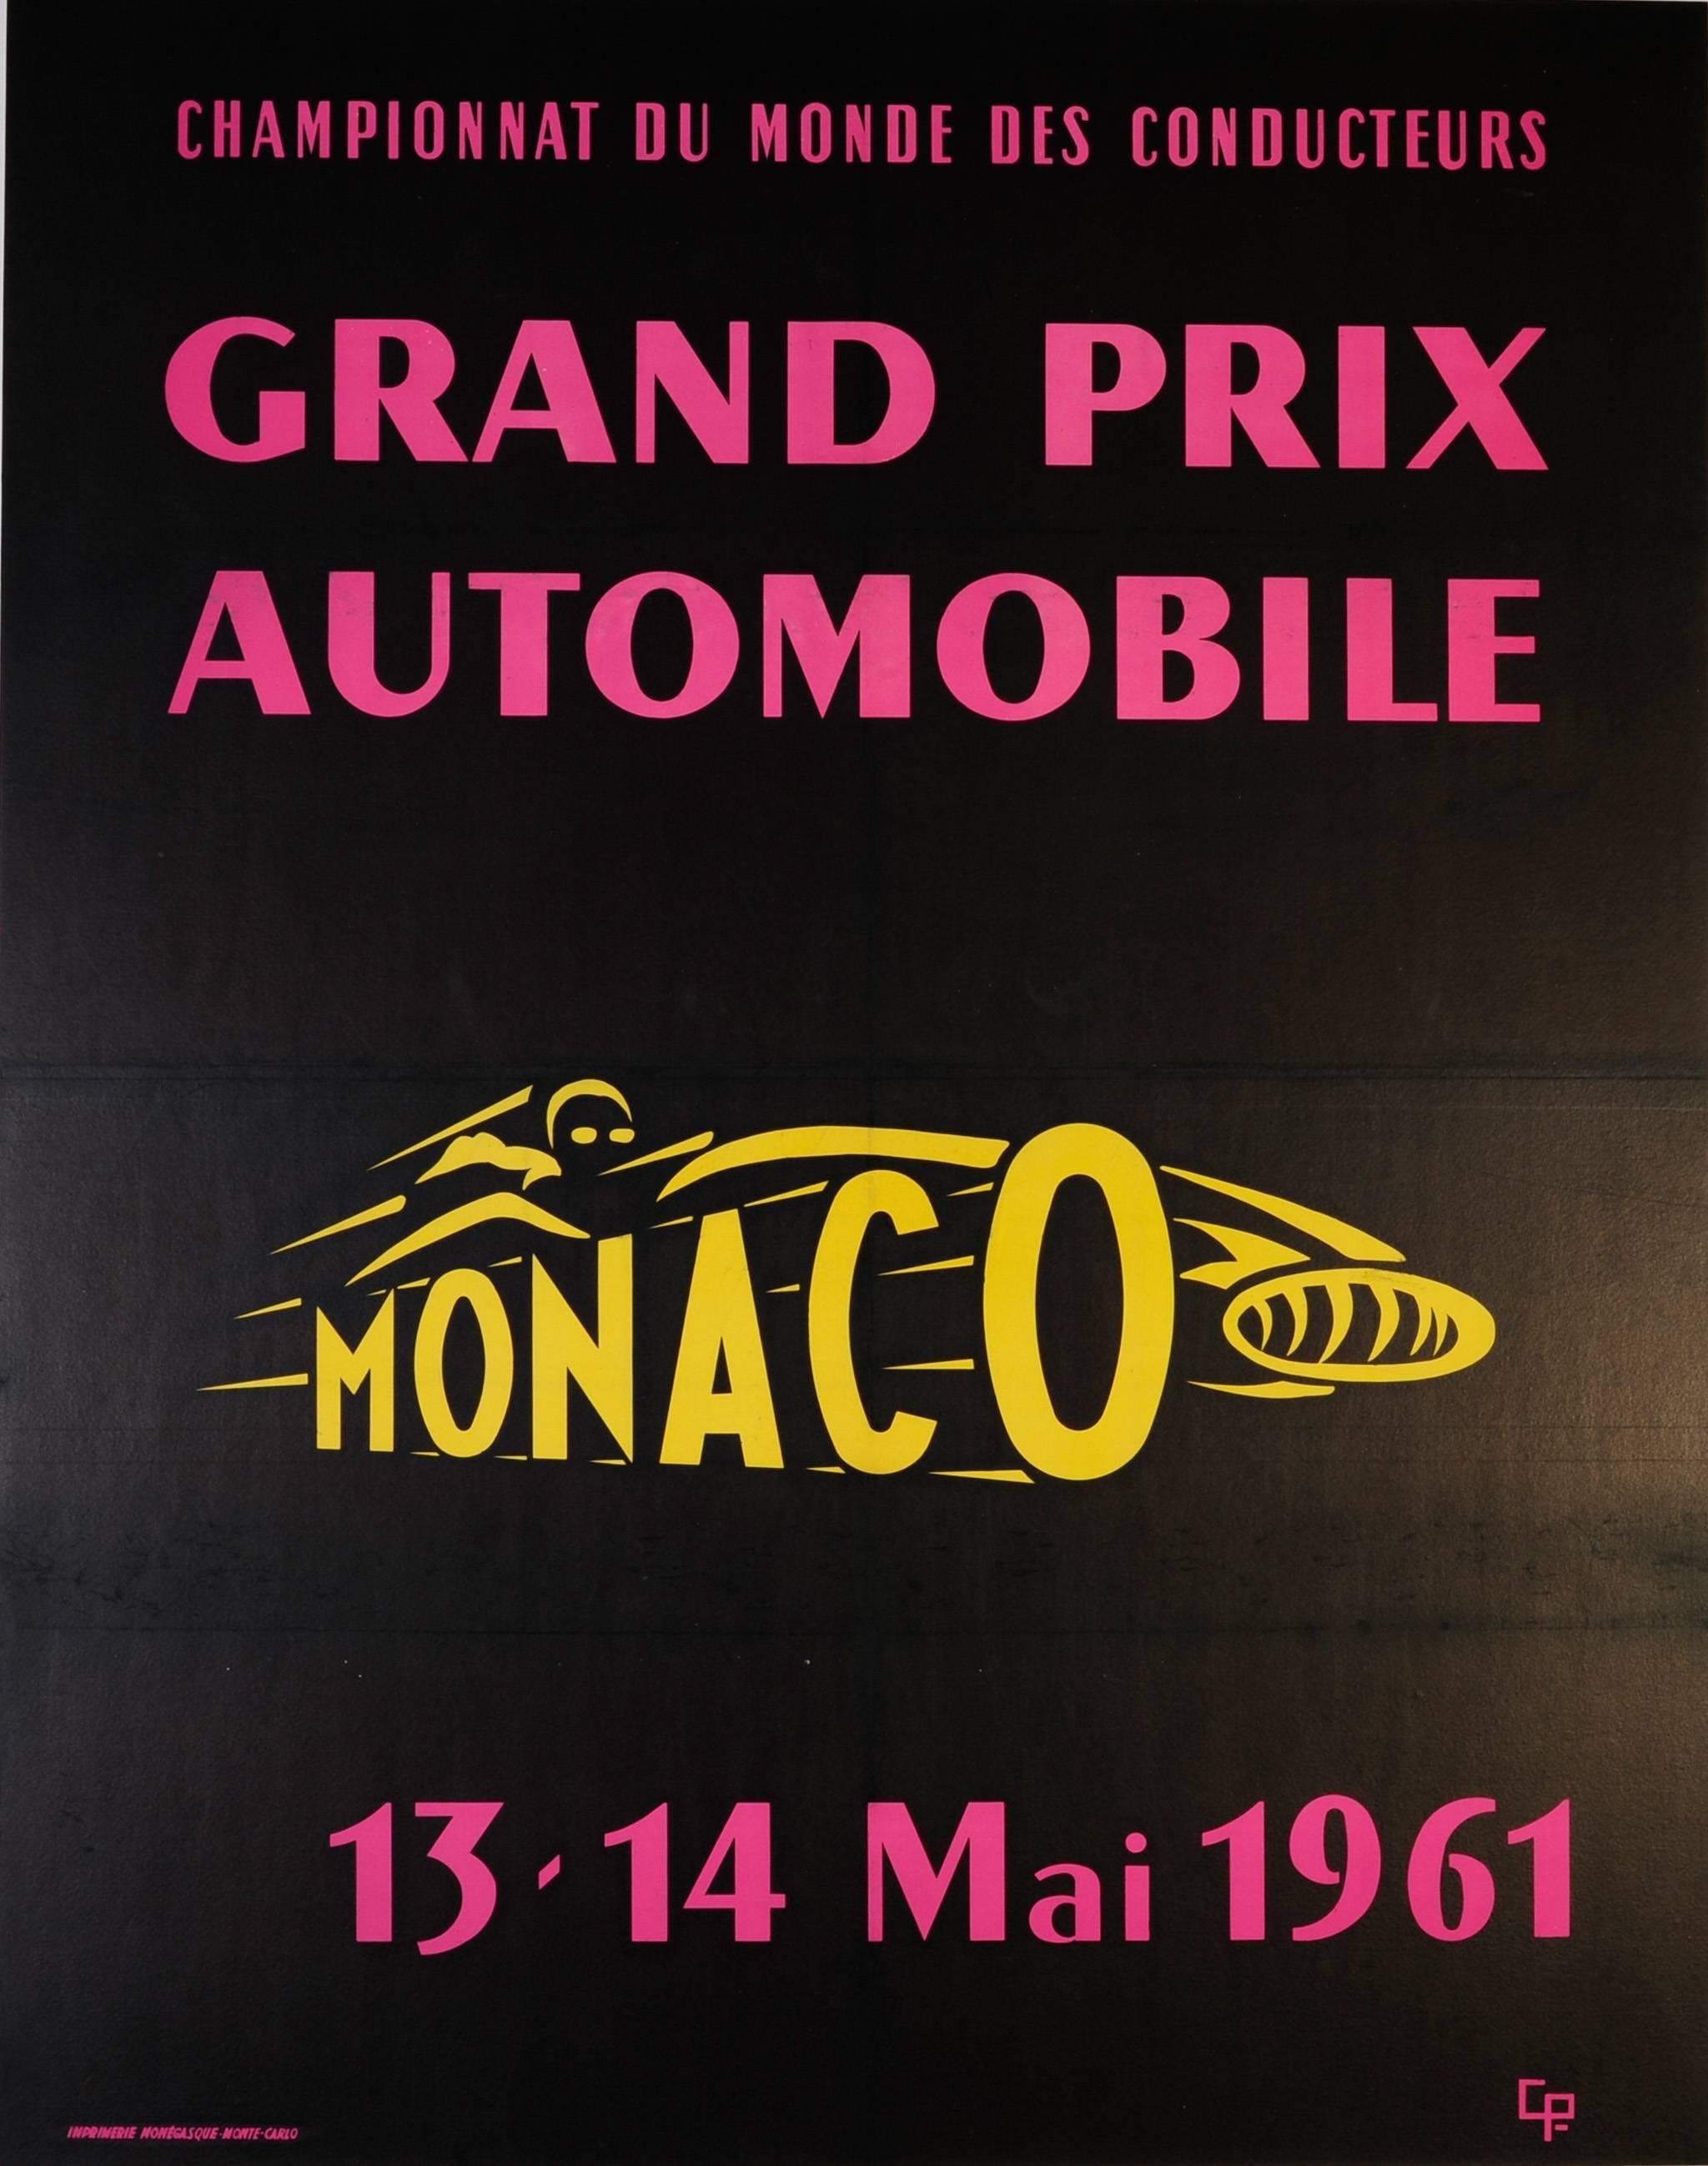 Large Original Vintage Car Racing Sport Event Poster - Monaco Grand Prix 1961